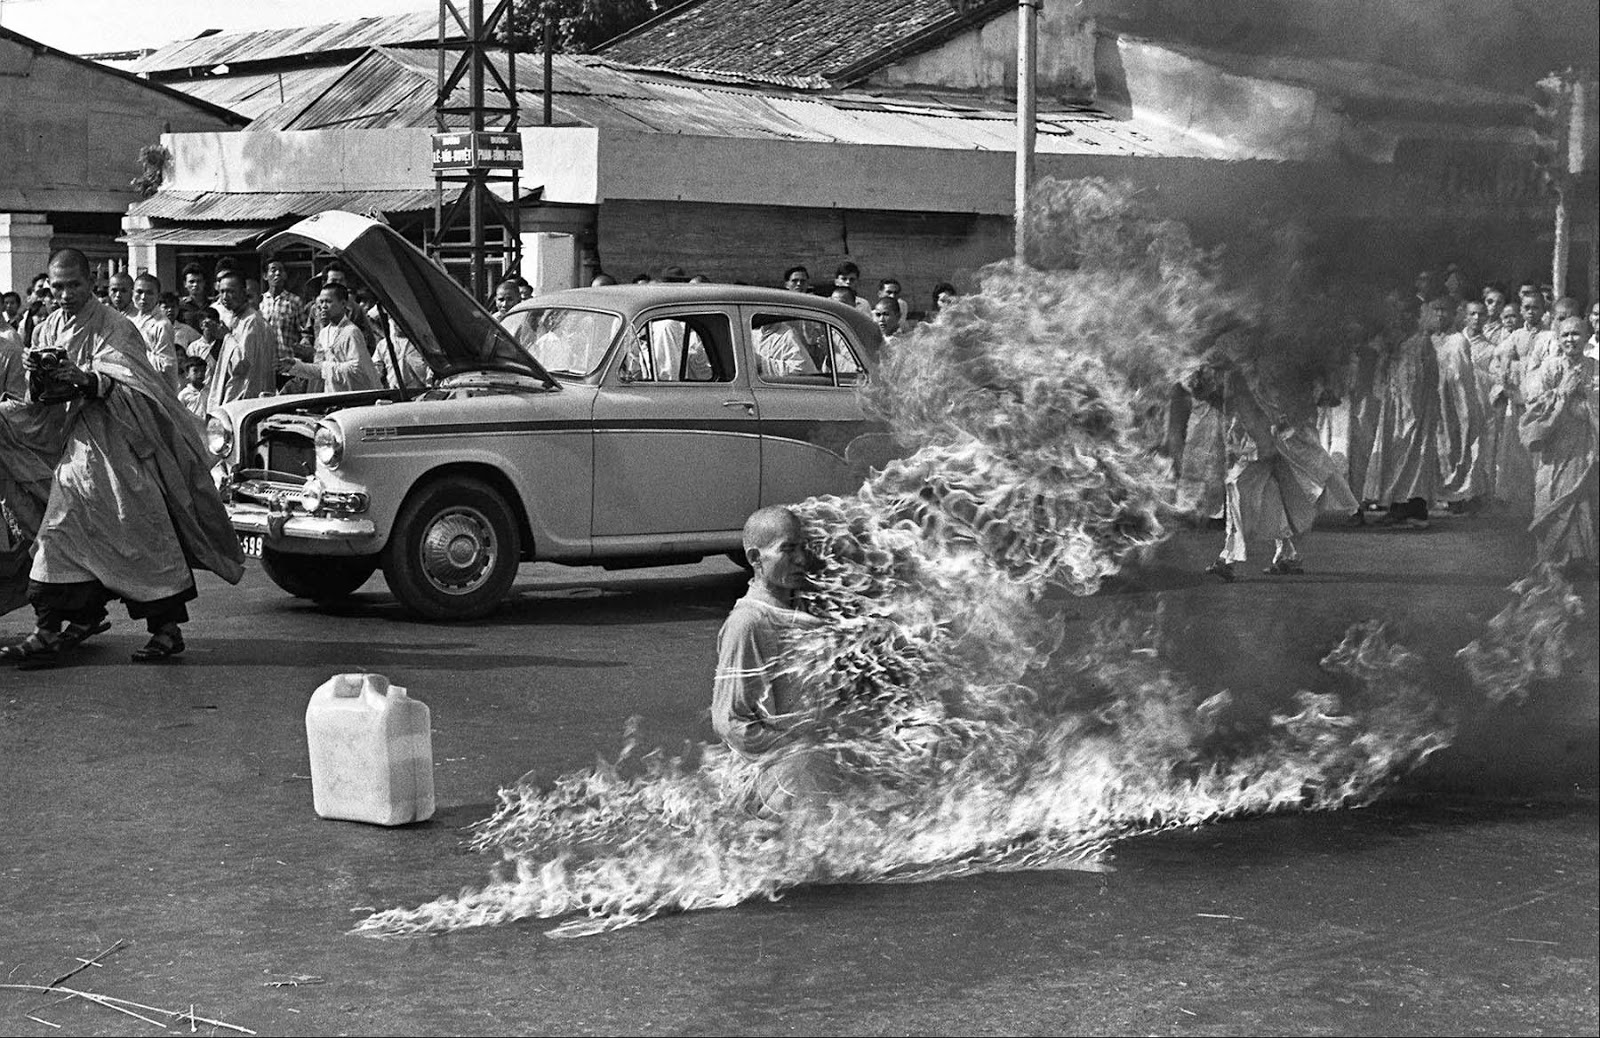 17. Самосожжение буддийского монаха, Малькольм Браун, 1963.